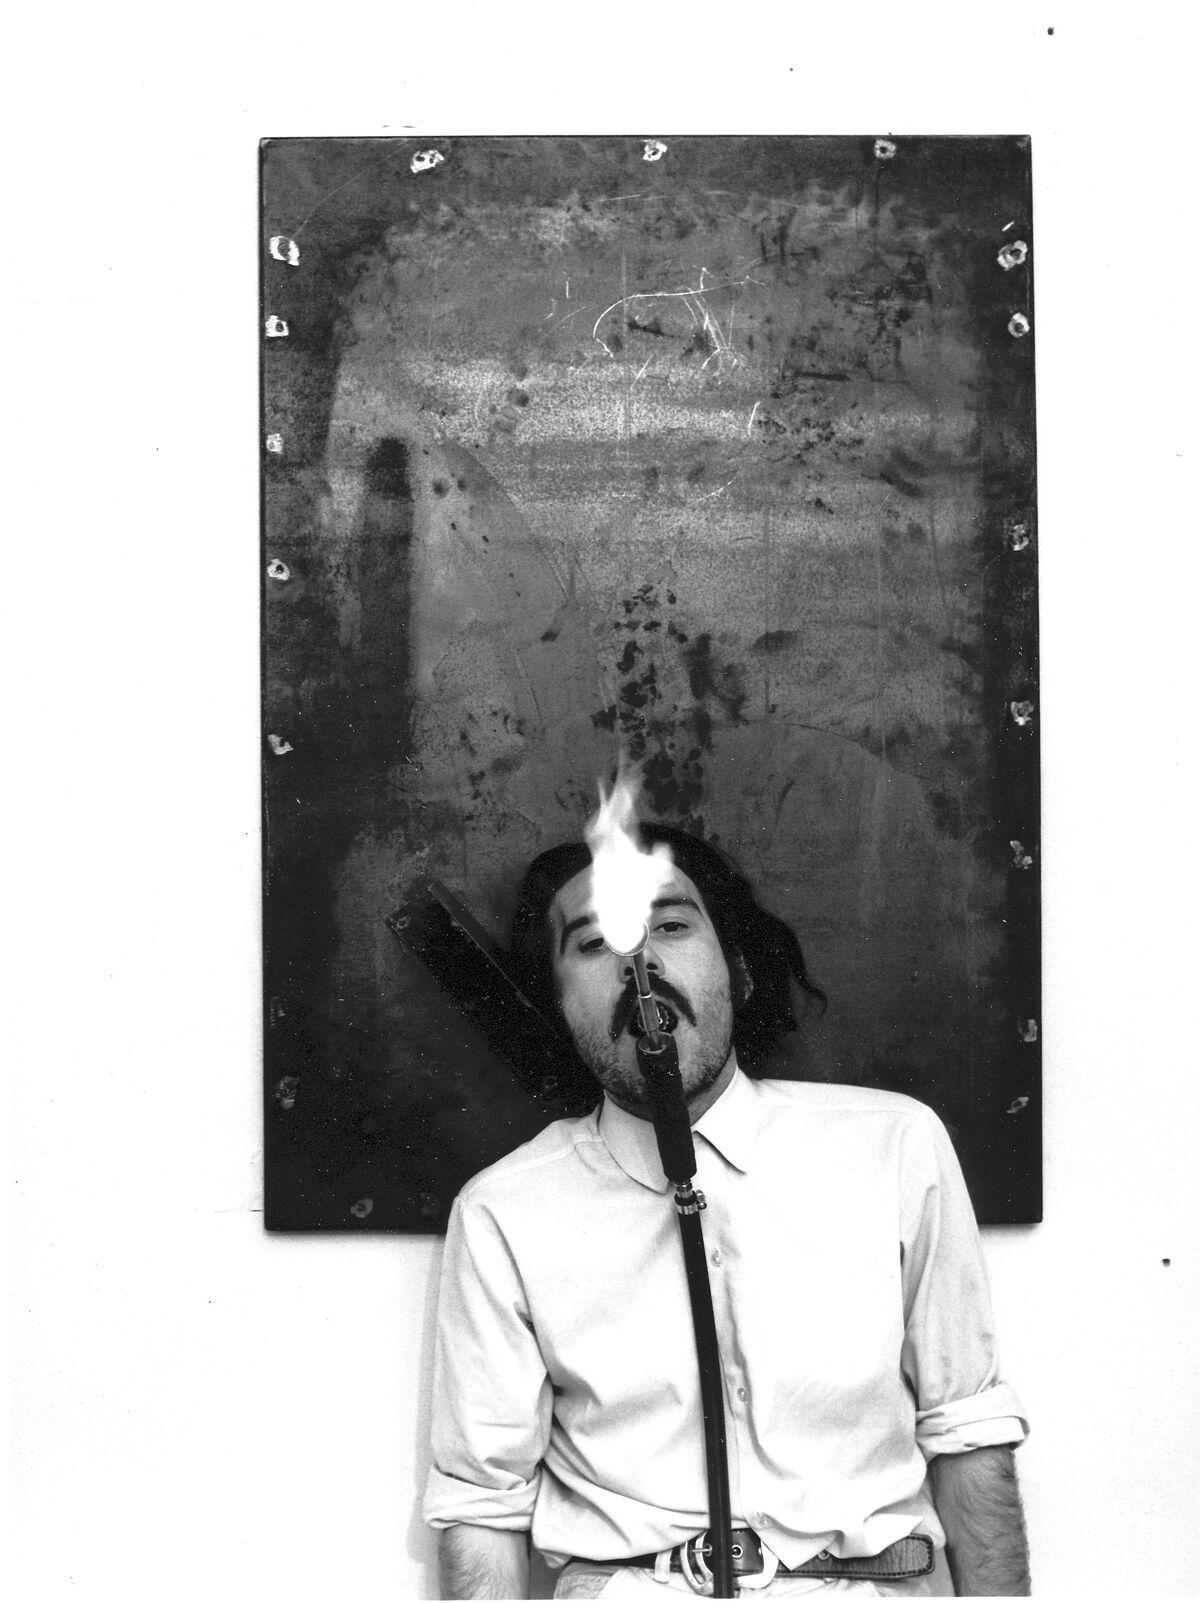 Portrait of Jannis Kounellis, Galleria Lucio Amelio, Naples, 1973. Photo by Caludio Abate. Courtesy of Fondazione Prada.